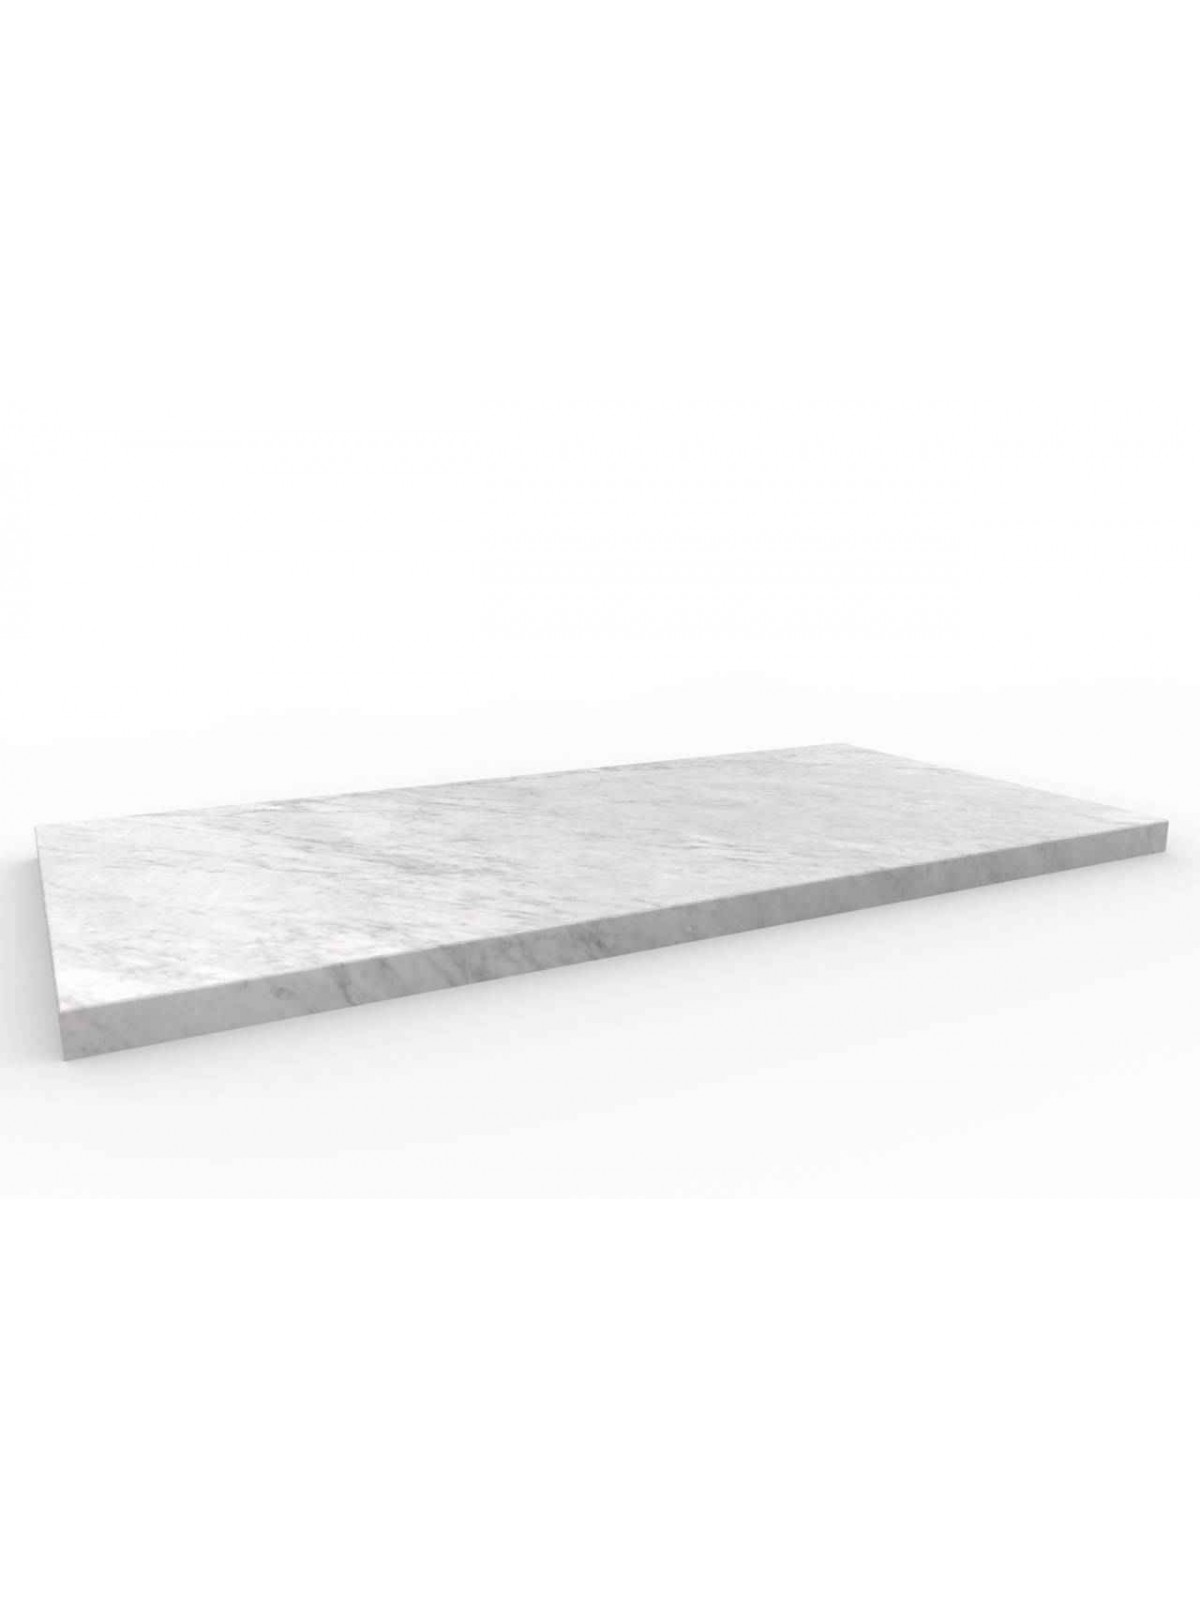 Bodenfliese I Bianco Carrara 60 x 30 cm